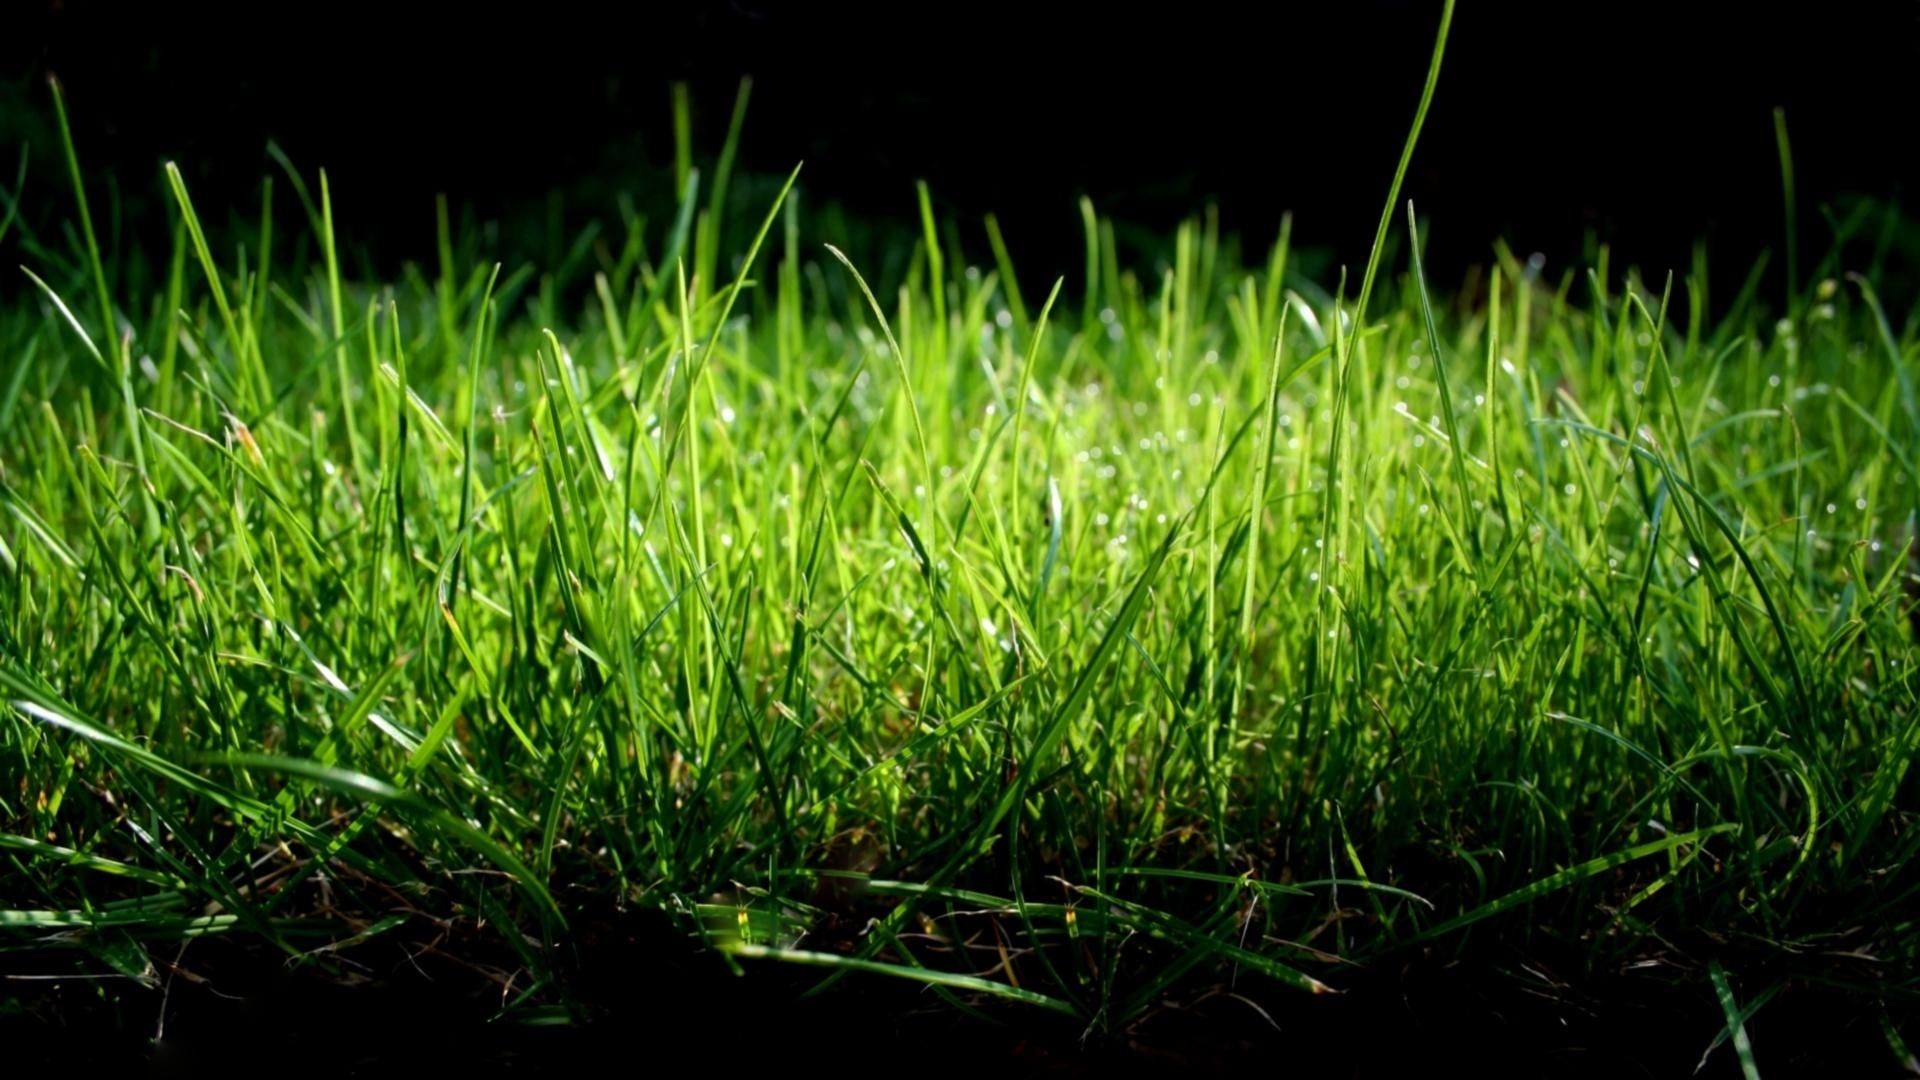 природа люди трава смотреть